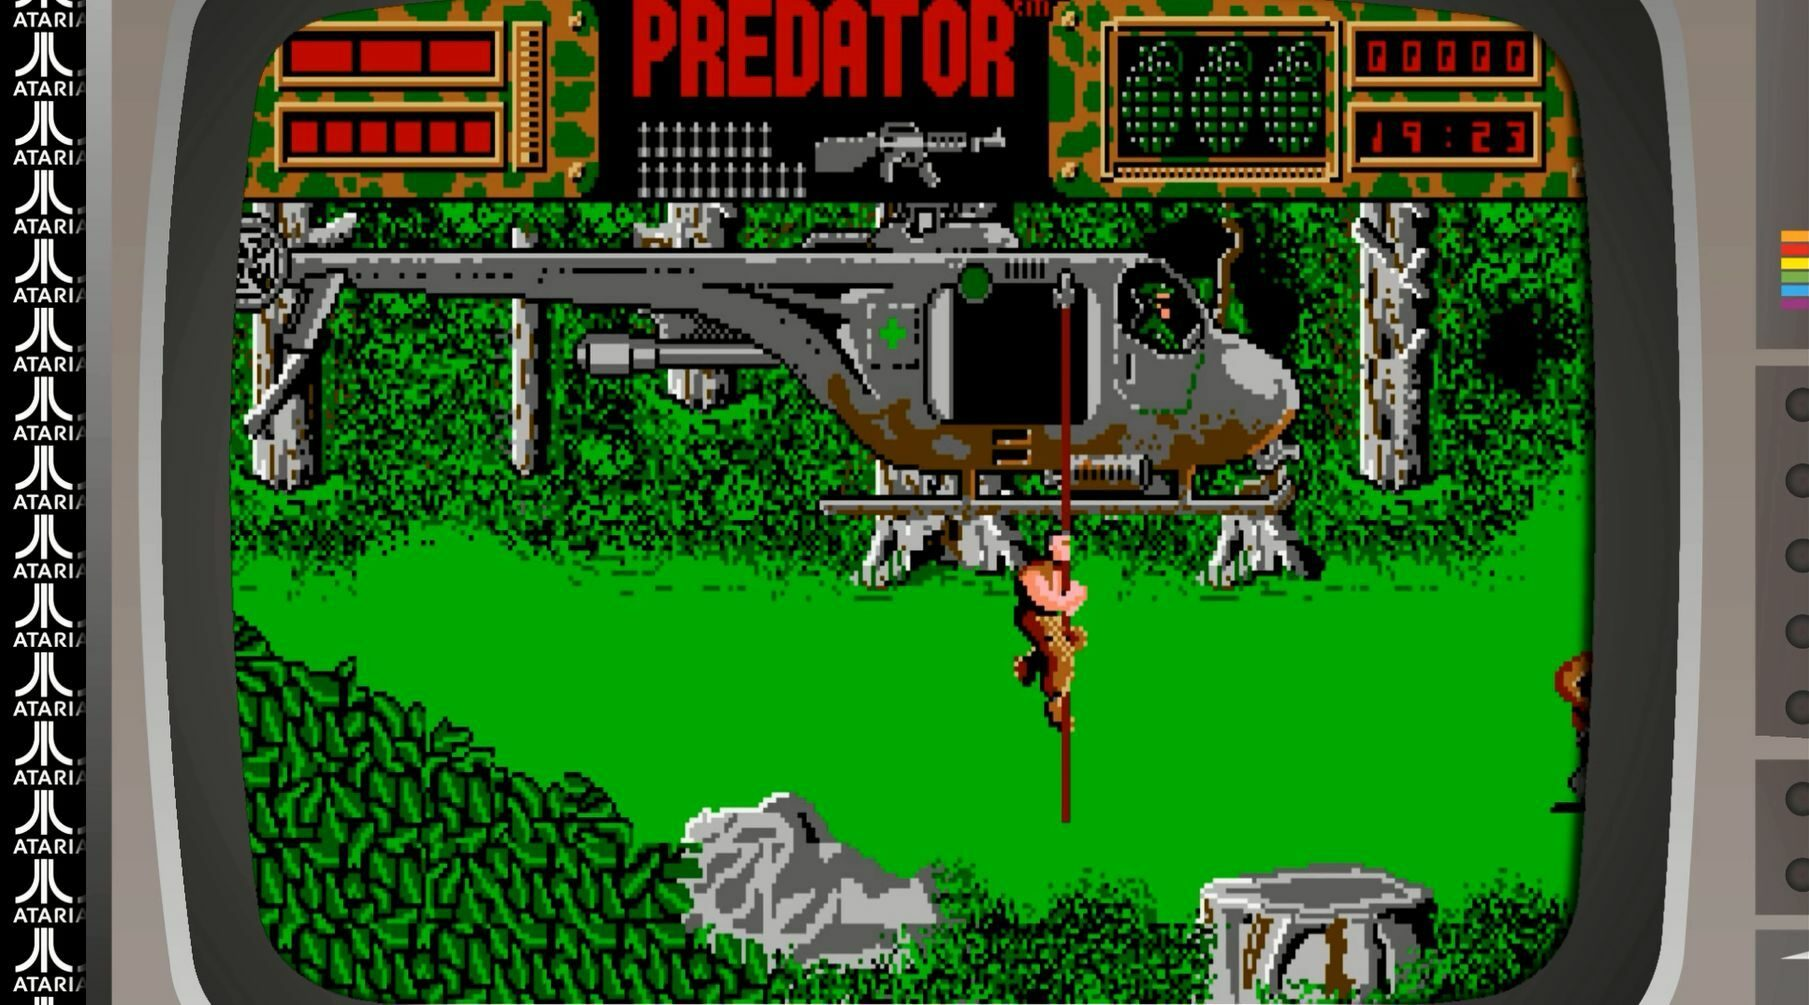 Top 7 Atari ST Games - Nostalgia Nerd